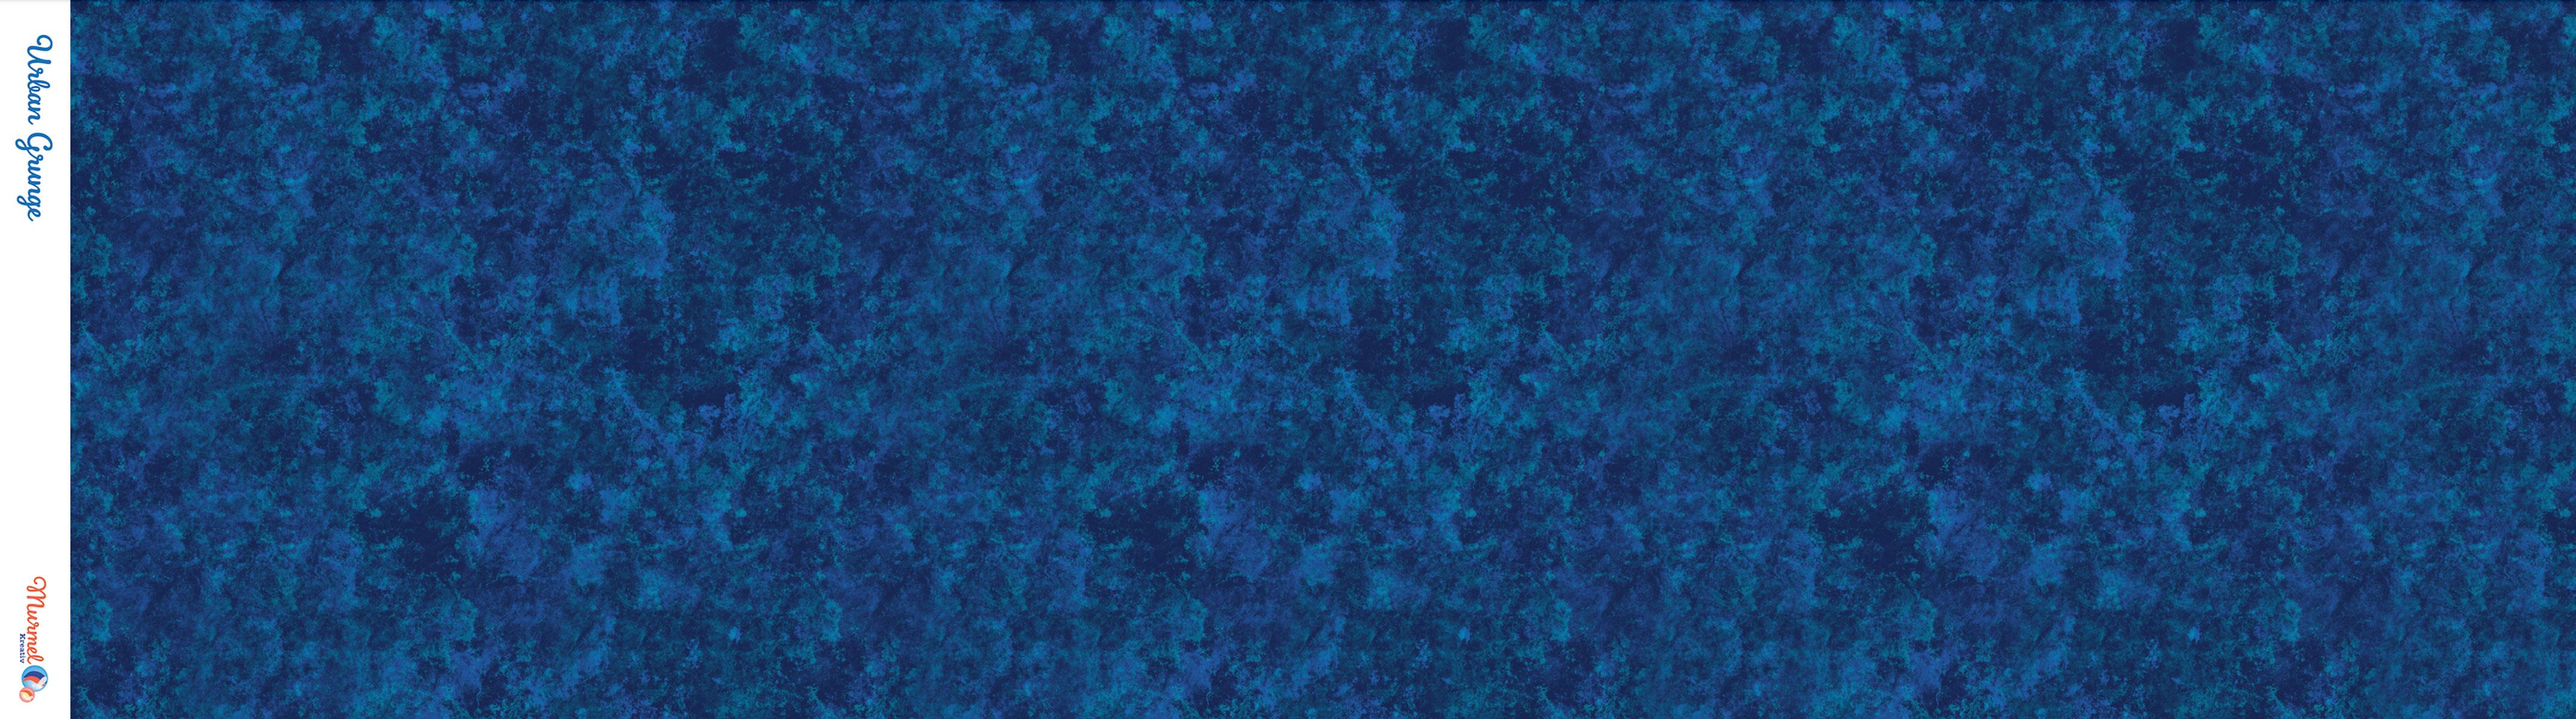 "Jersey Urban grunge ""dunkel blau"" Meterware"